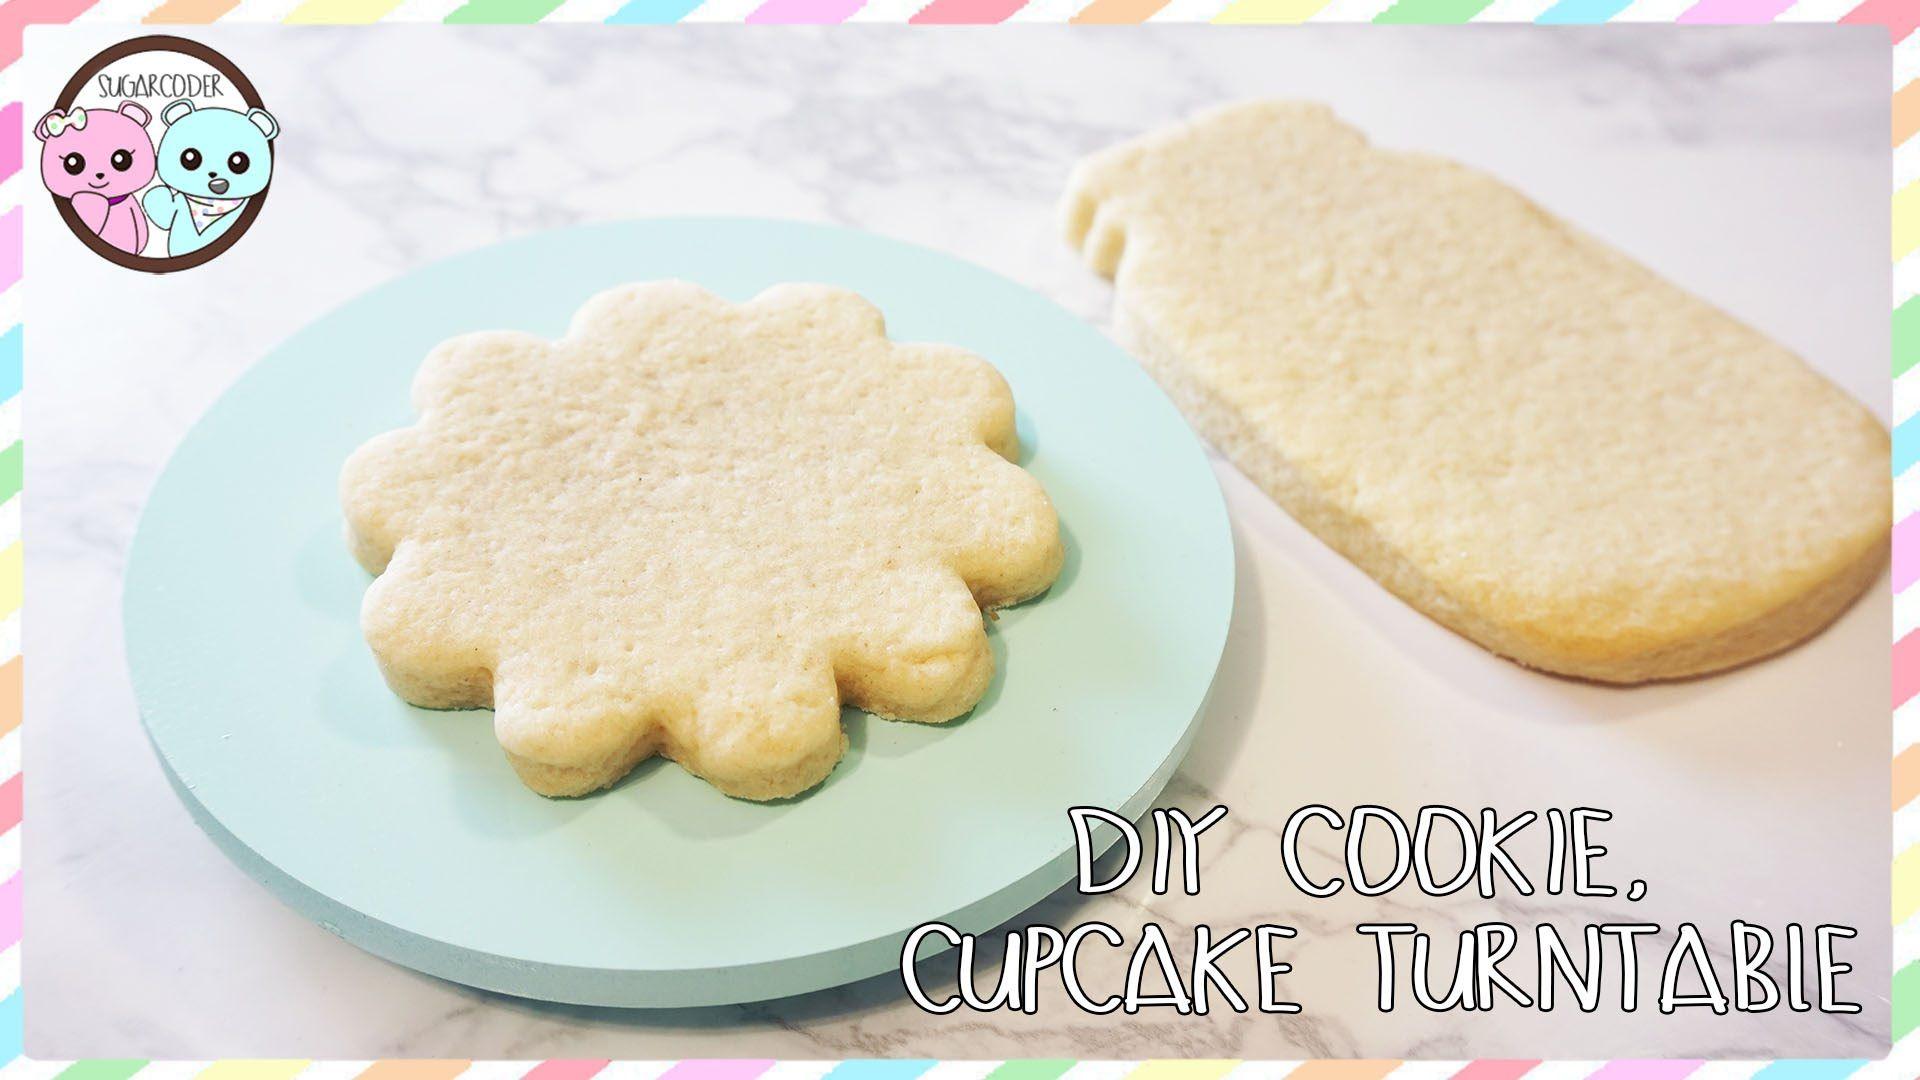 Mini Cookie Turntable Baking Tools Cookie Making Supplies Mini Cake Turntable Cookie Decorating Supplies Cookie Decorating Turntable